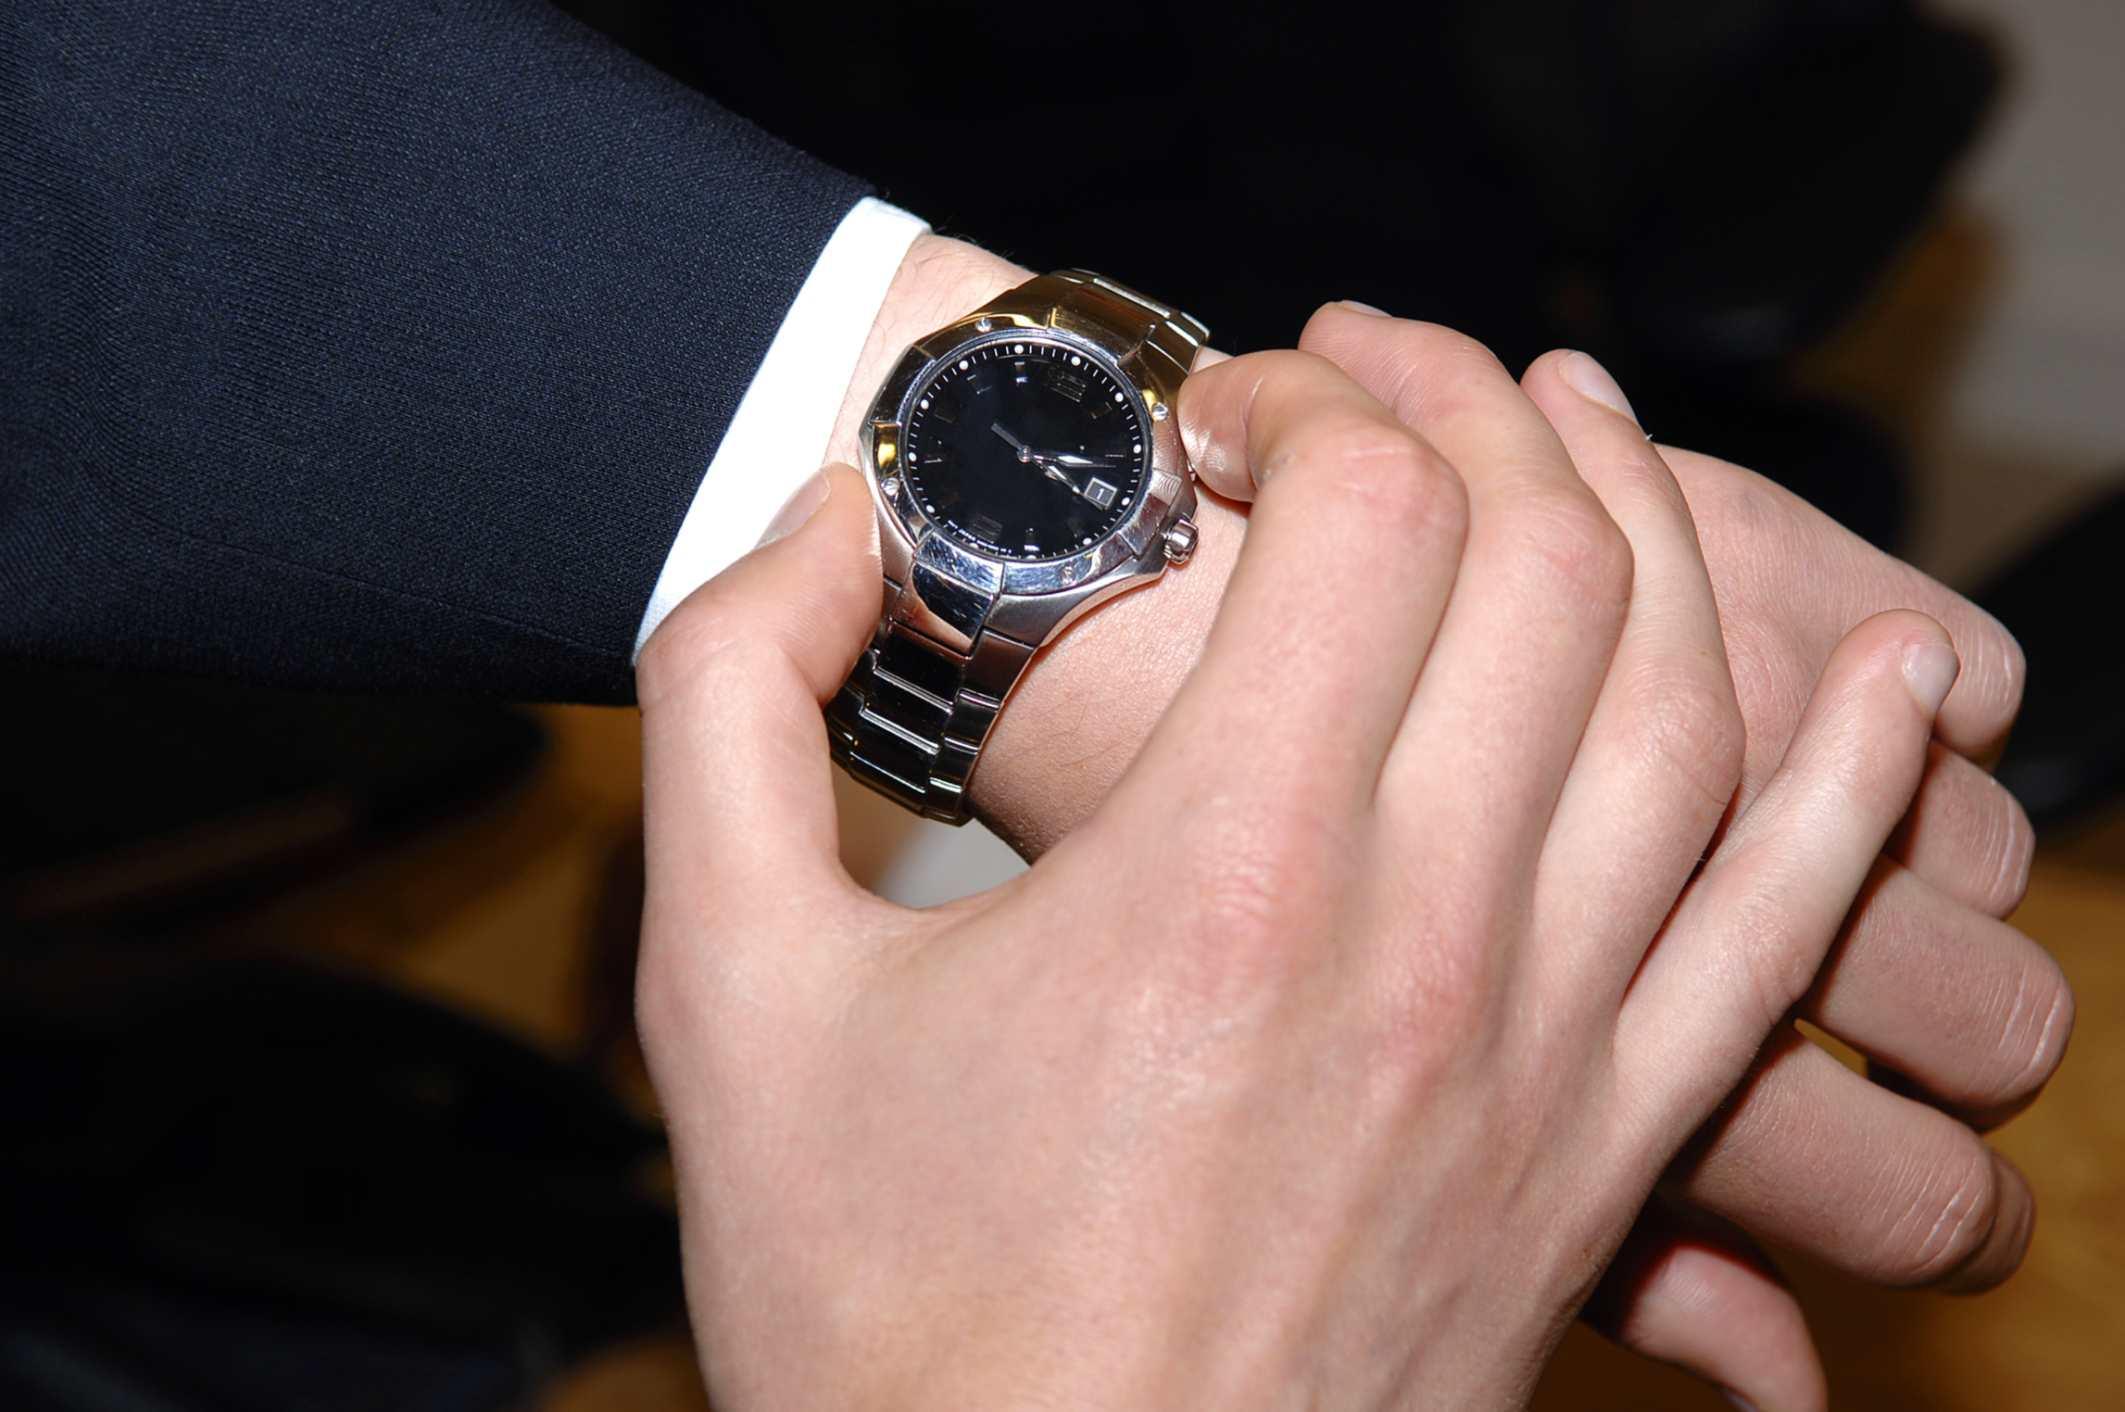 Male adjusting watch